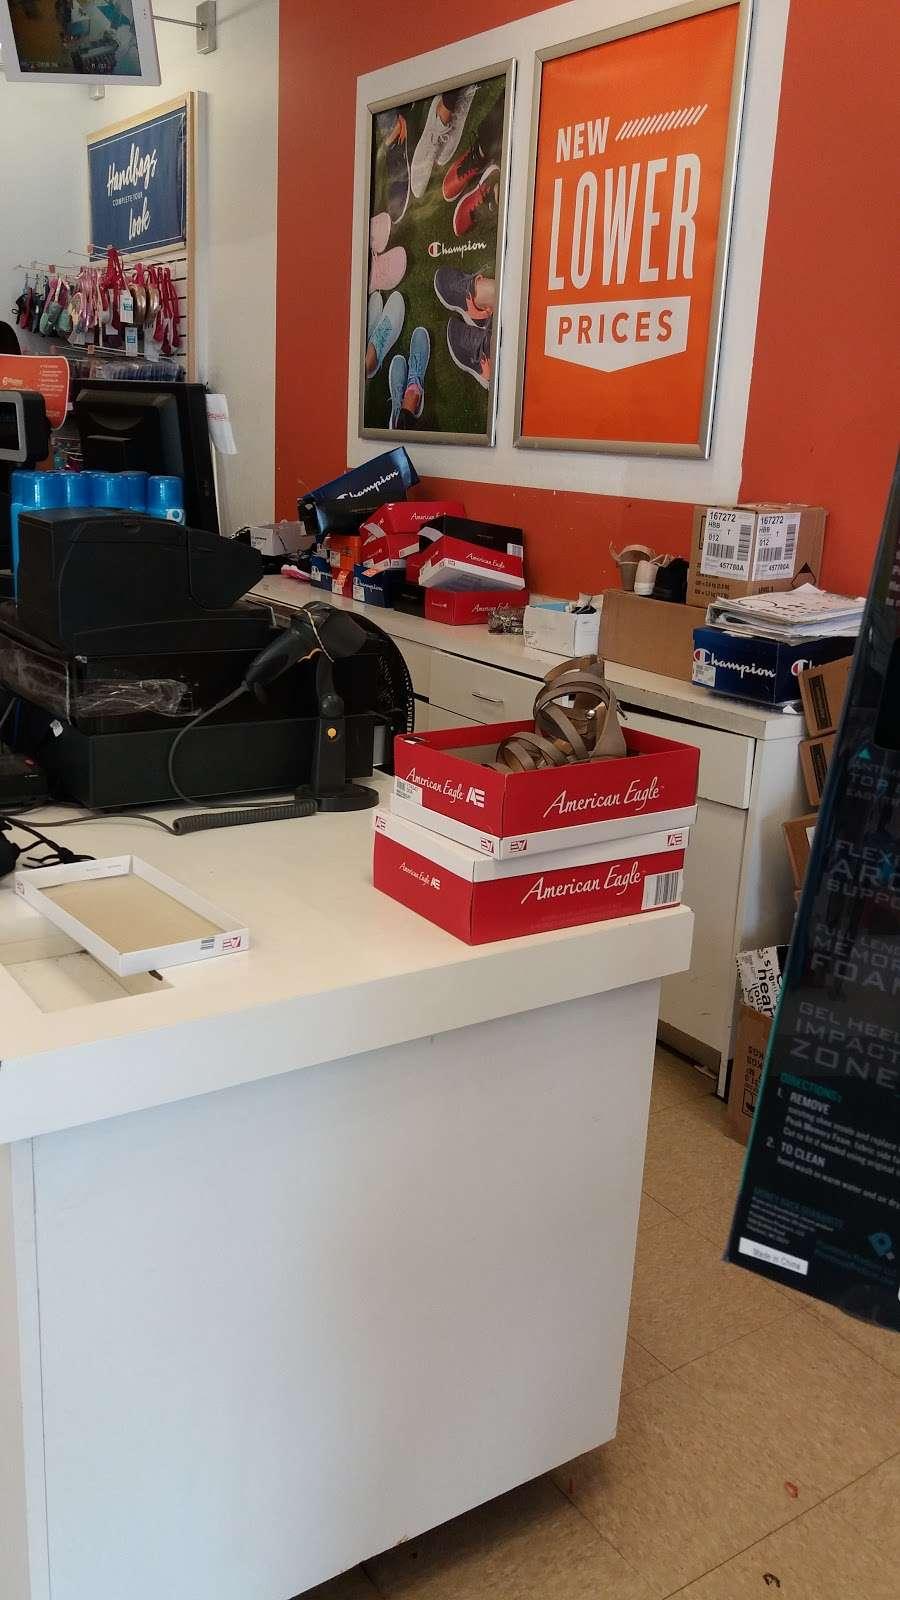 Payless ShoeSource - shoe store  | Photo 4 of 5 | Address: 2260 Bartow Ave, Bronx, NY 10475, USA | Phone: (718) 379-5894